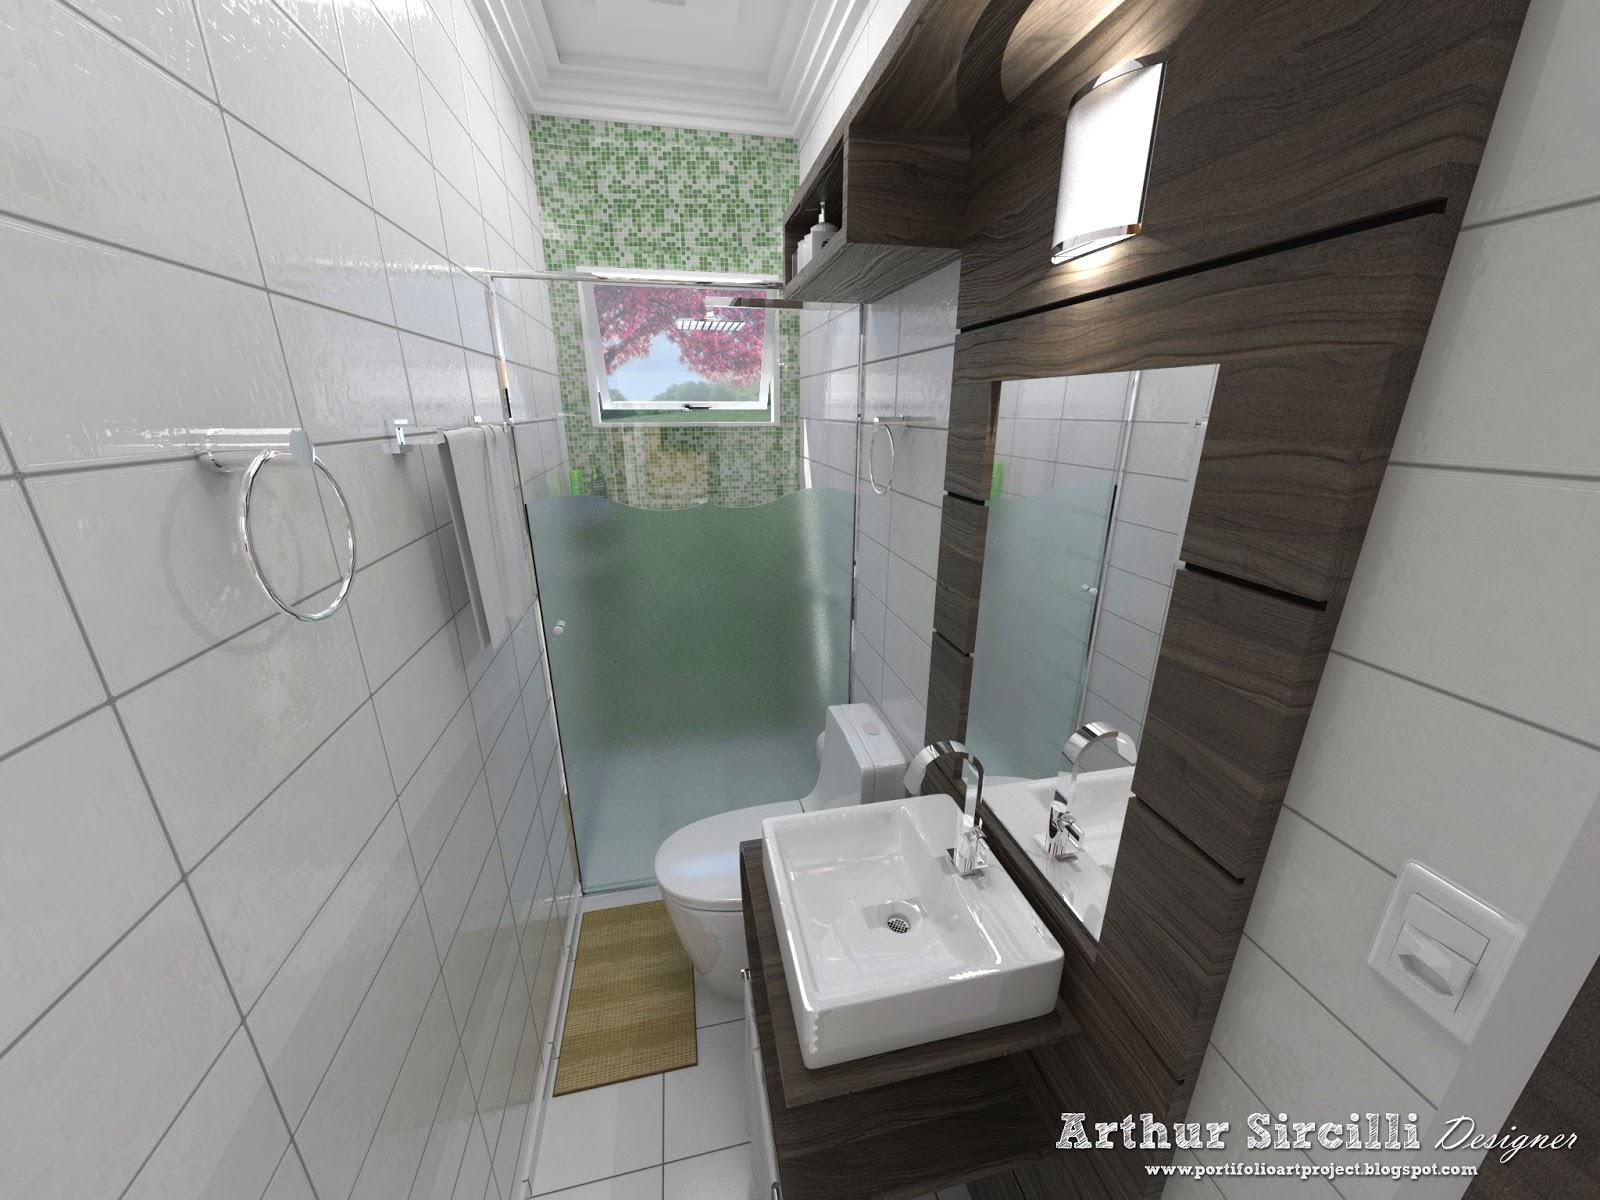 Banheiro Pequeno ArtProject #6B6148 1600 1200